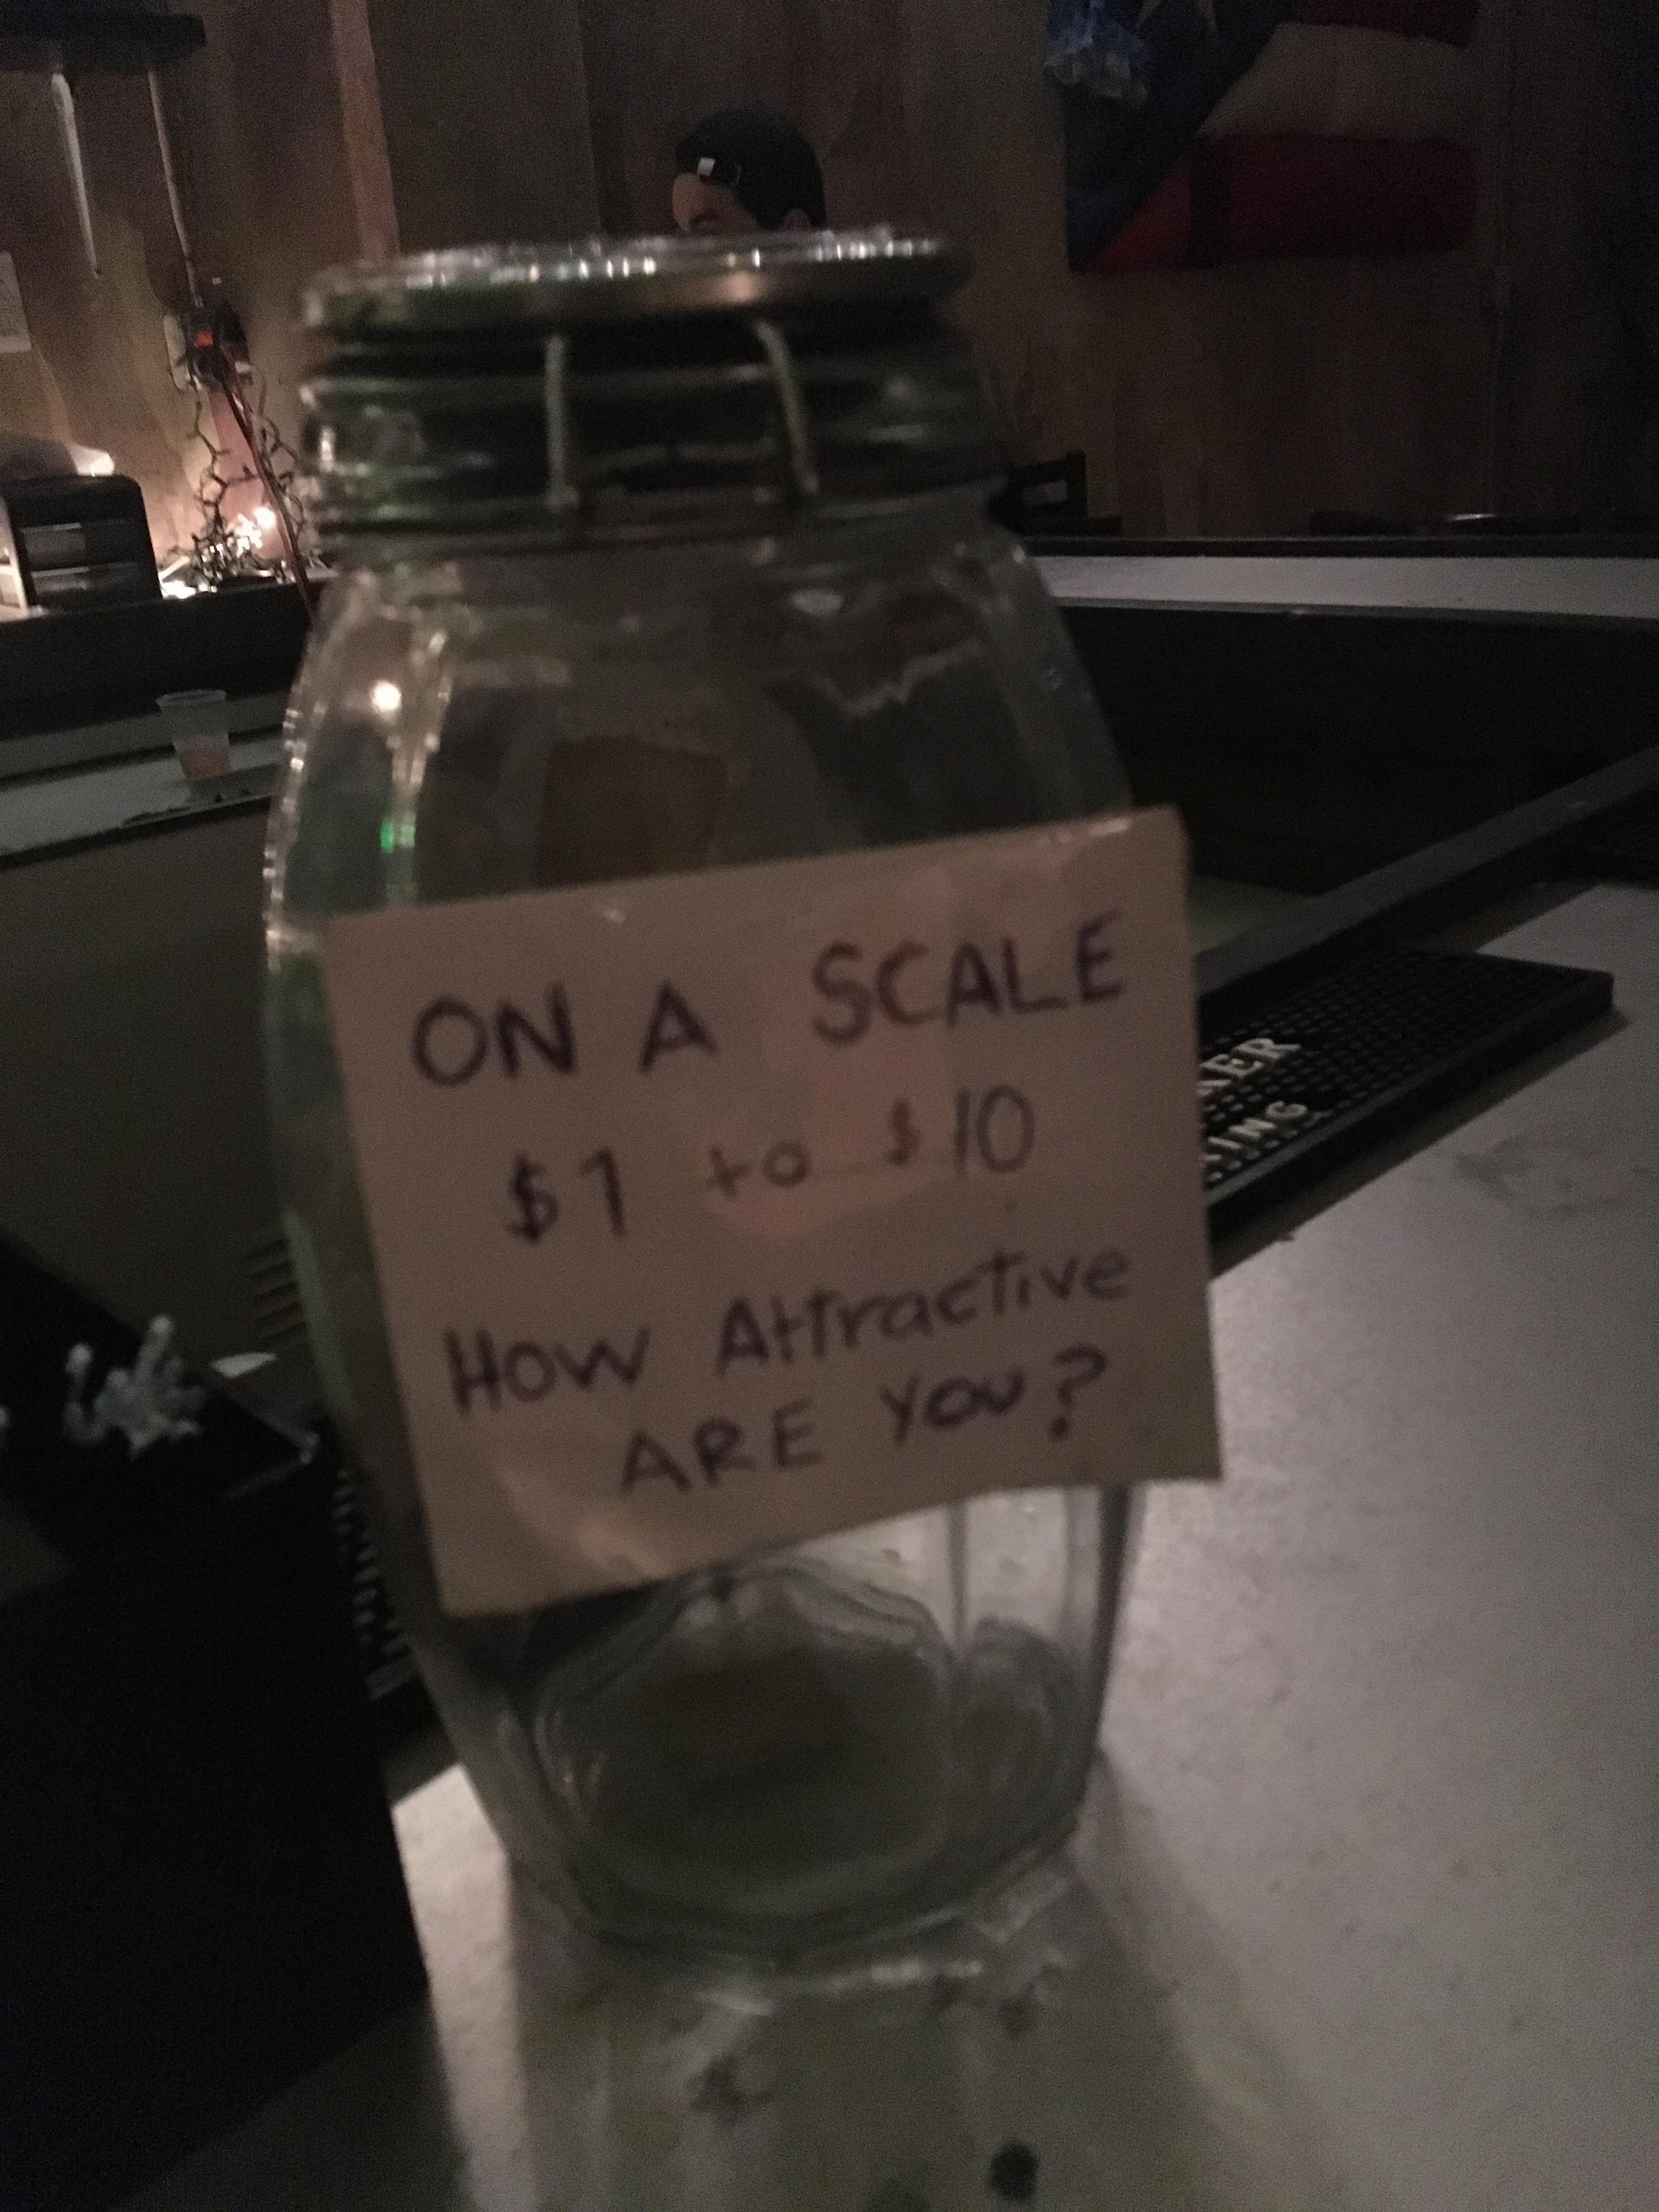 This tip jar